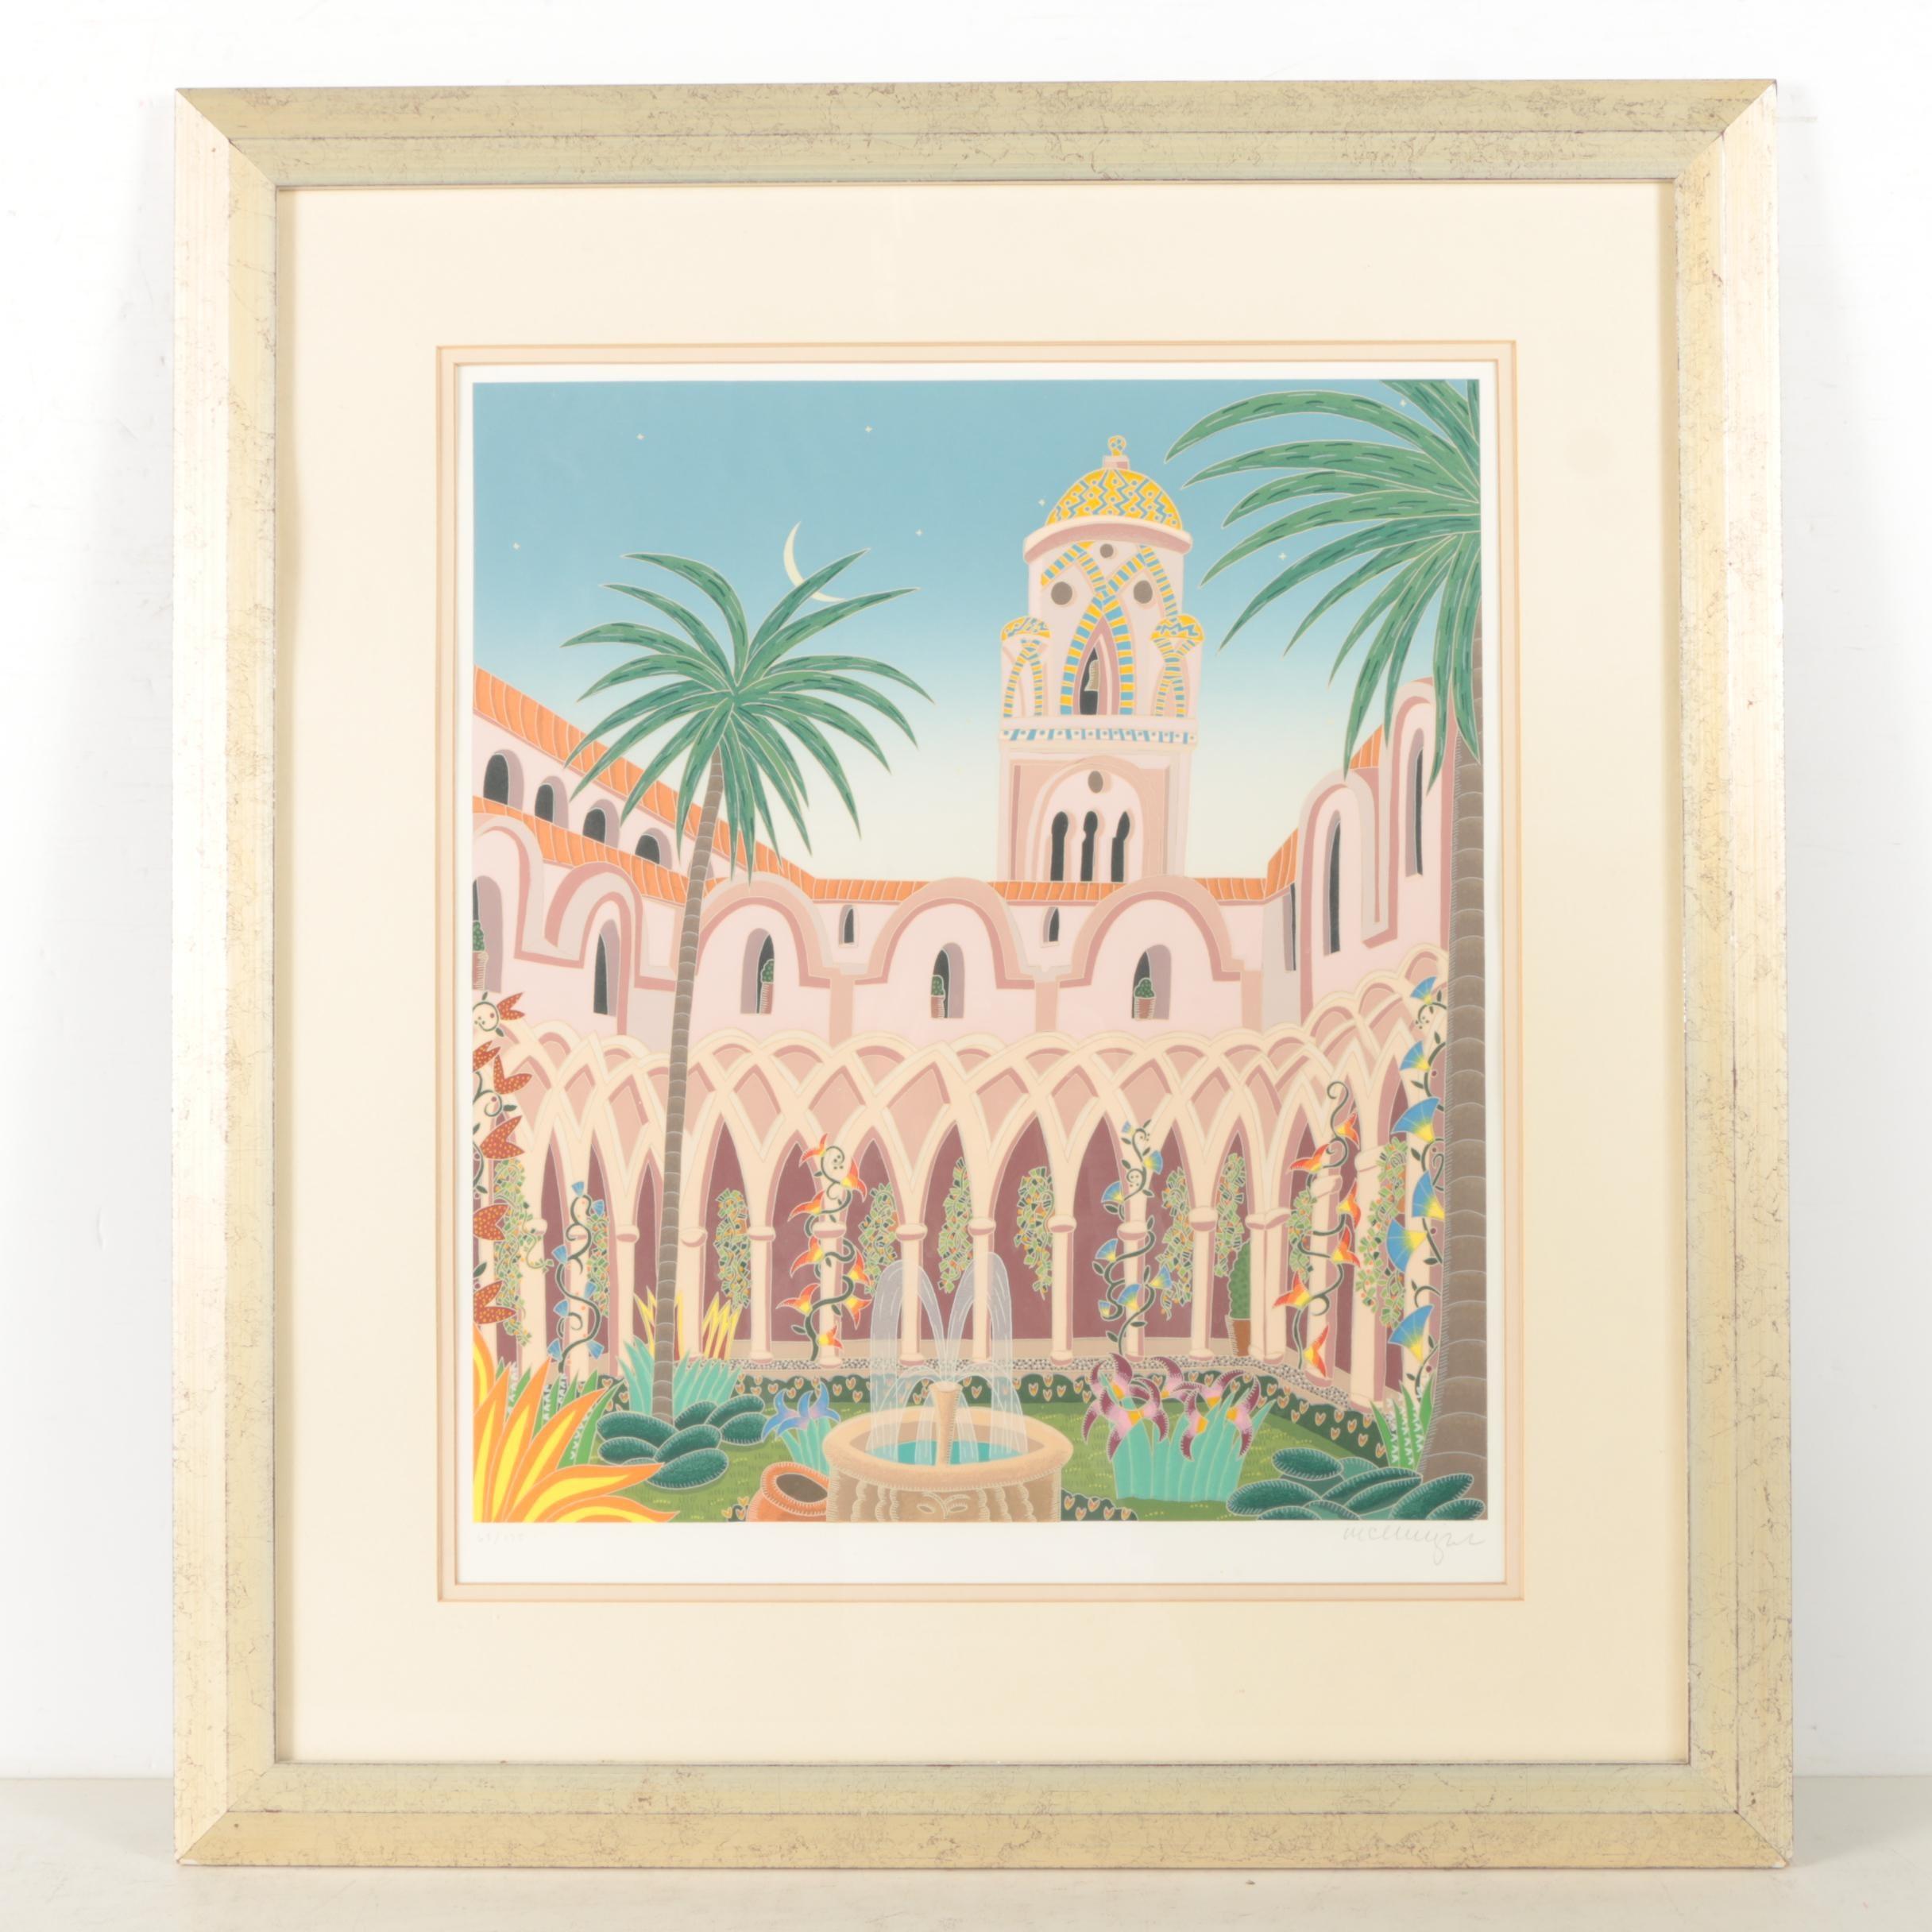 "Thomas McKnight 1987 Limited Edition Serigraph on Wove Paper ""Amalfi Cloister"""